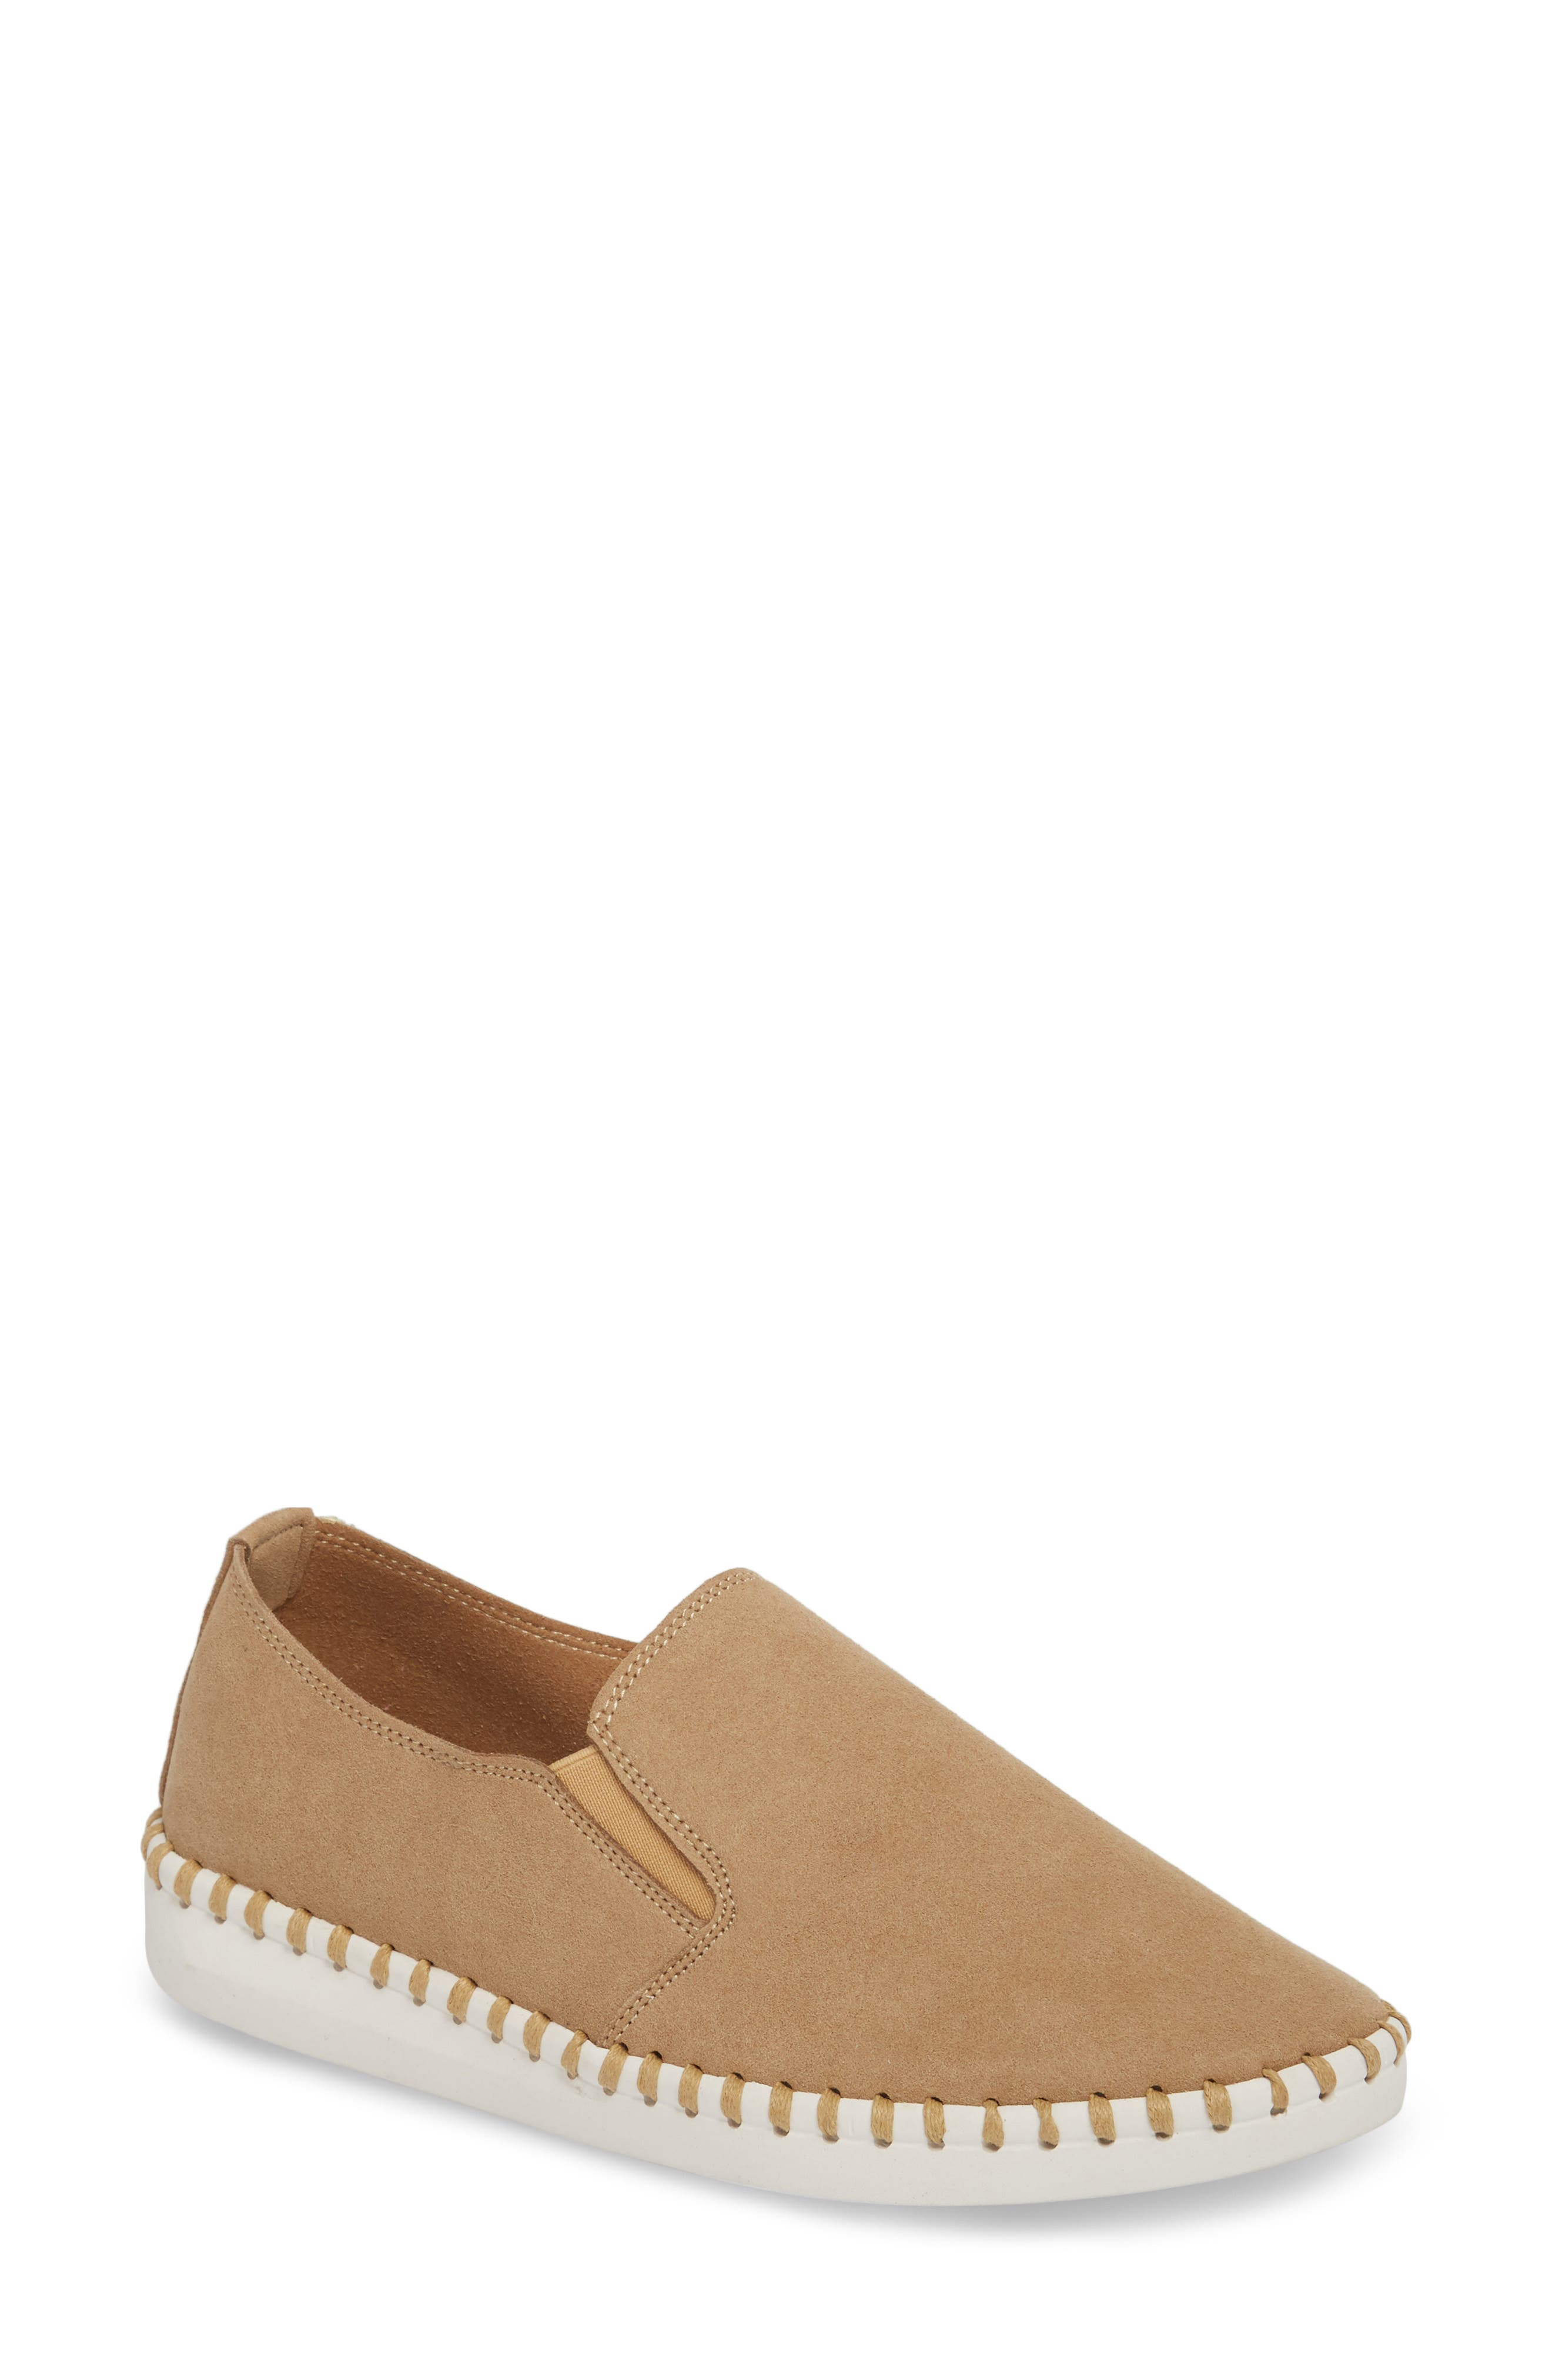 DÄV Salinas Waterproof Slip-On Sneaker, Main, color, TAN FABRIC